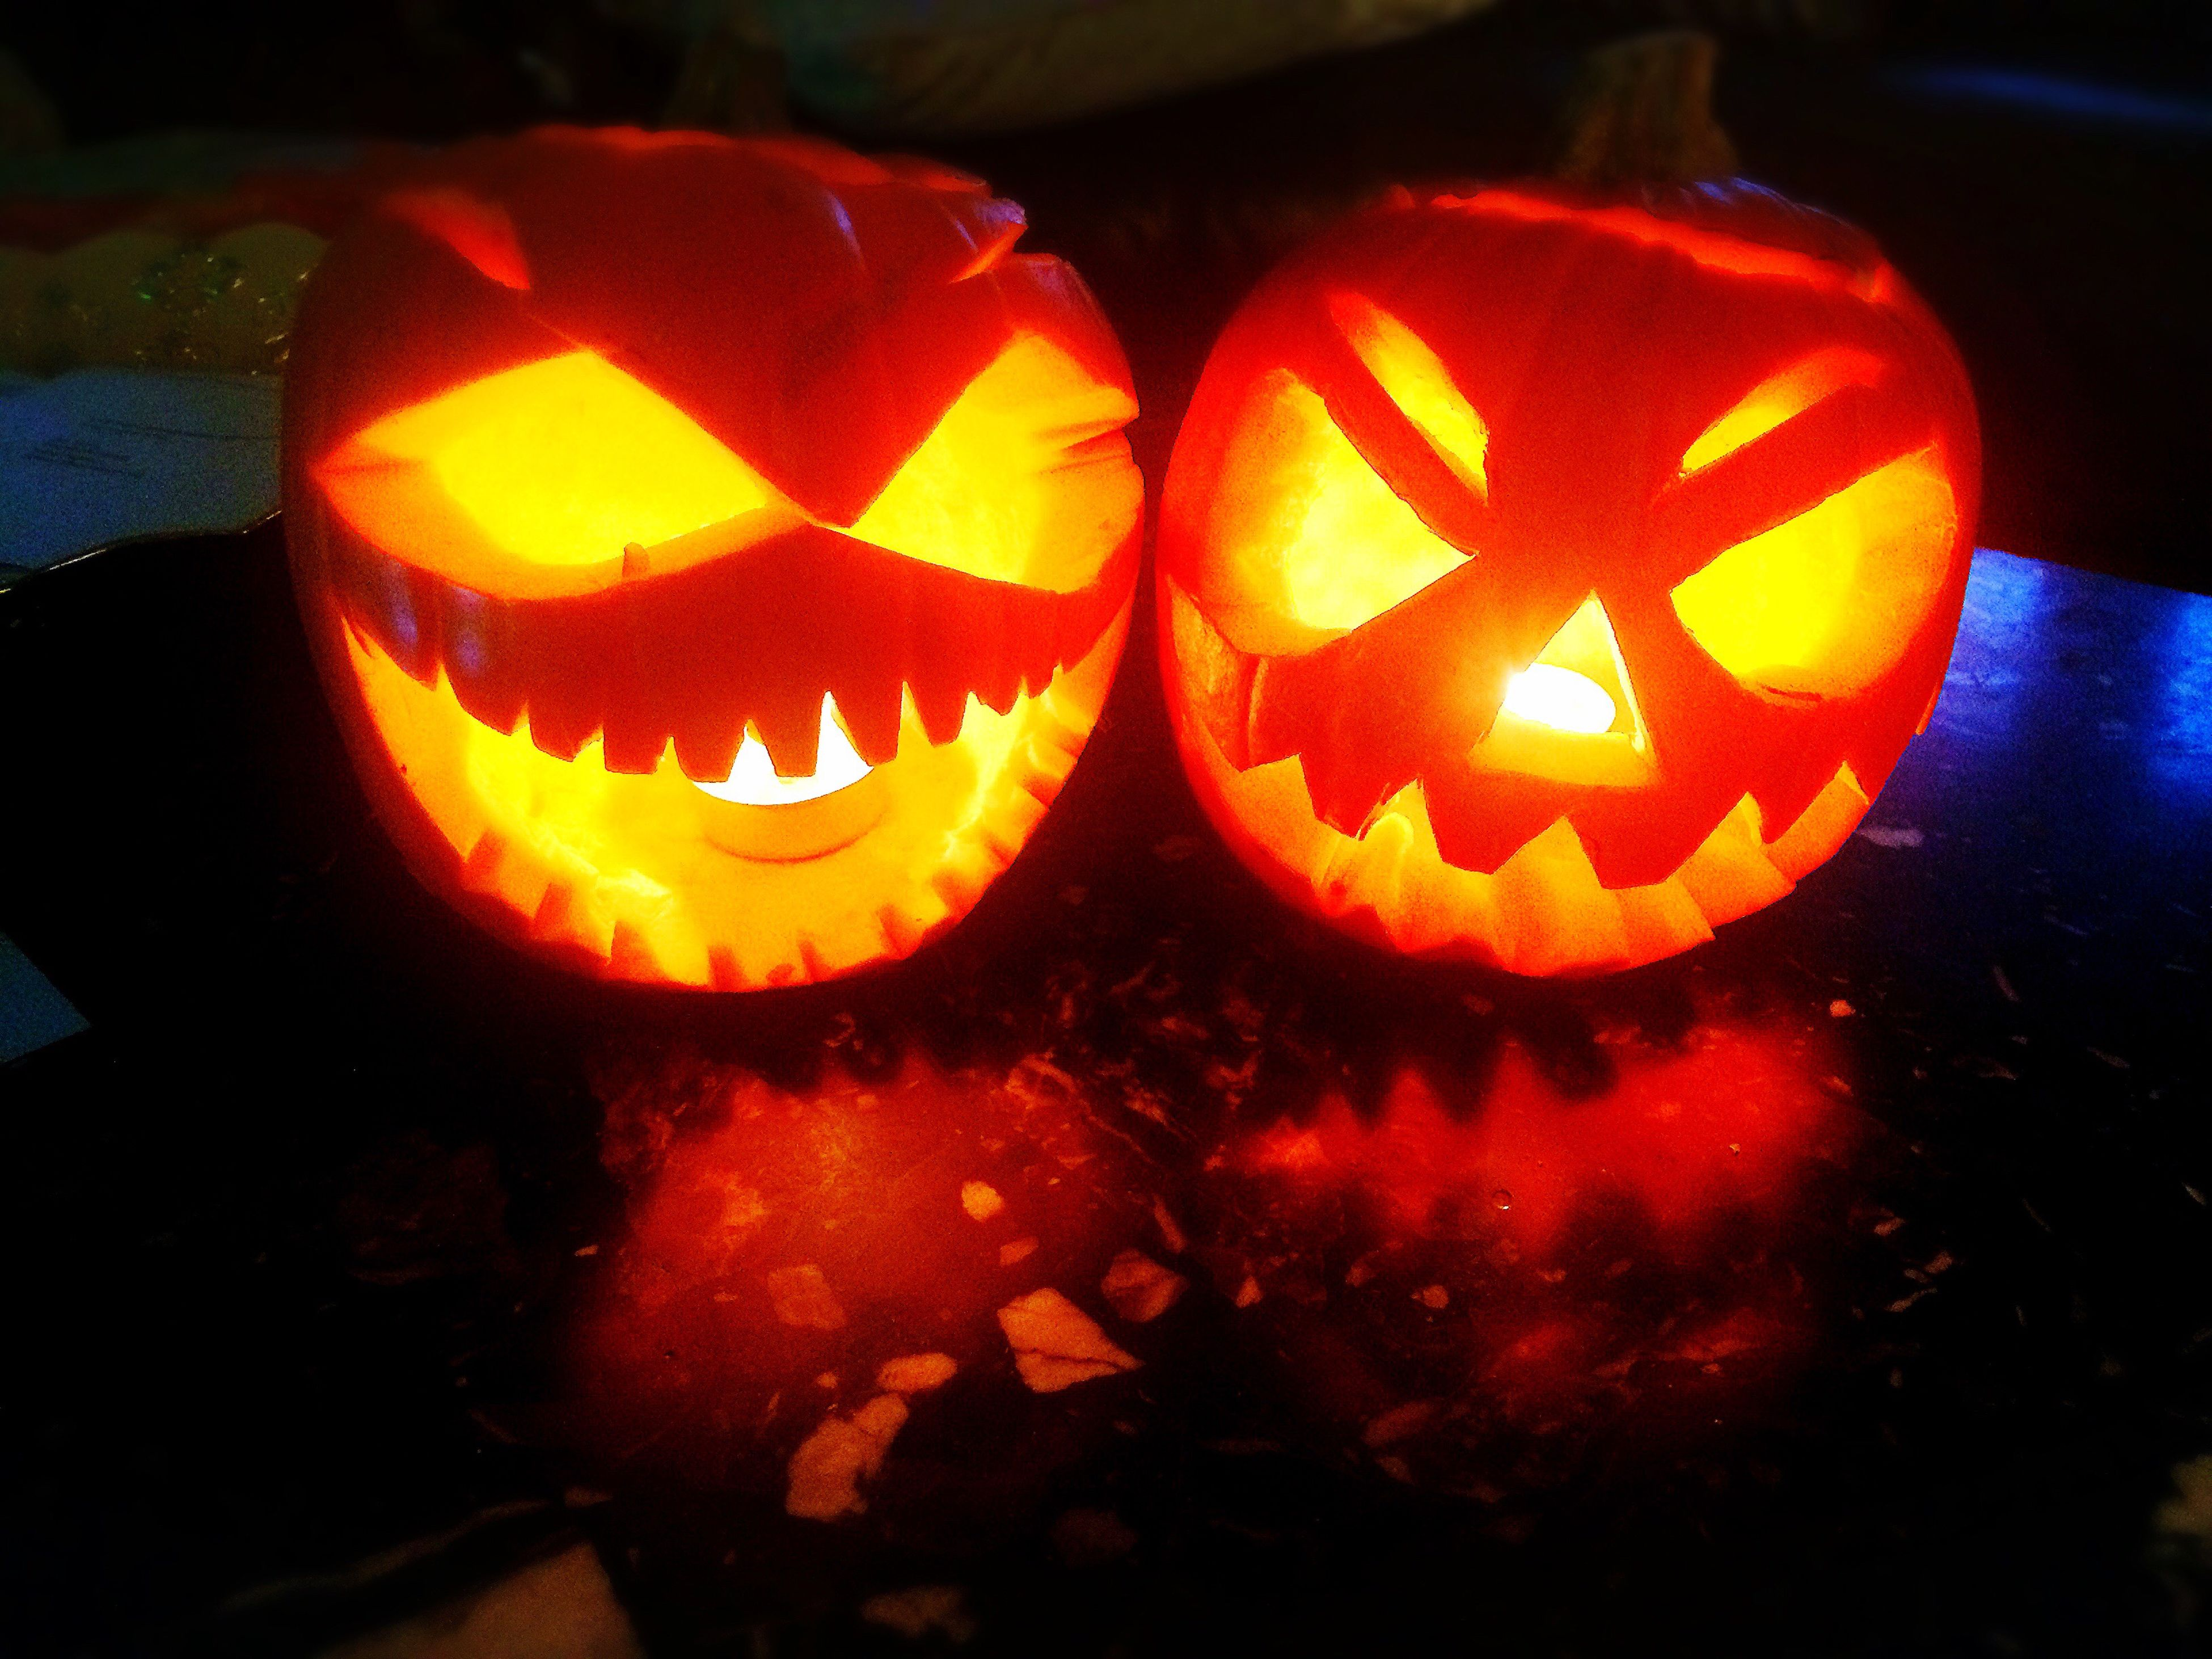 illuminated, anthropomorphic face, halloween, pumpkin, night, celebration, jack o lantern, tradition, close-up, food, no people, indoors